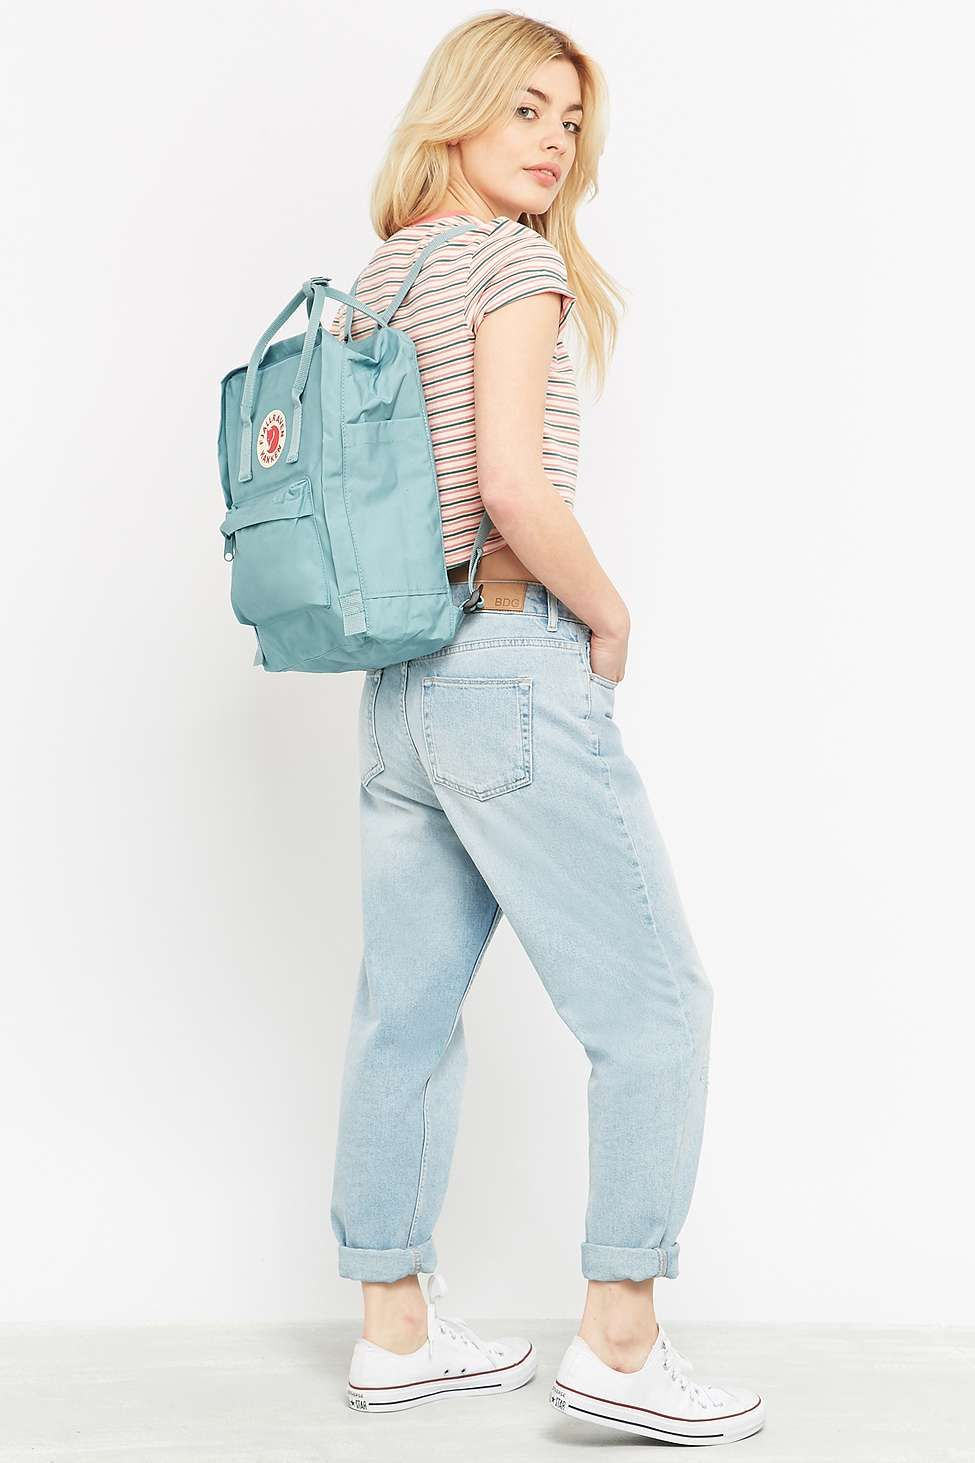 Fjallraven Kanken Classic Sky Blue Backpack Absolutely Love This Ocean Green